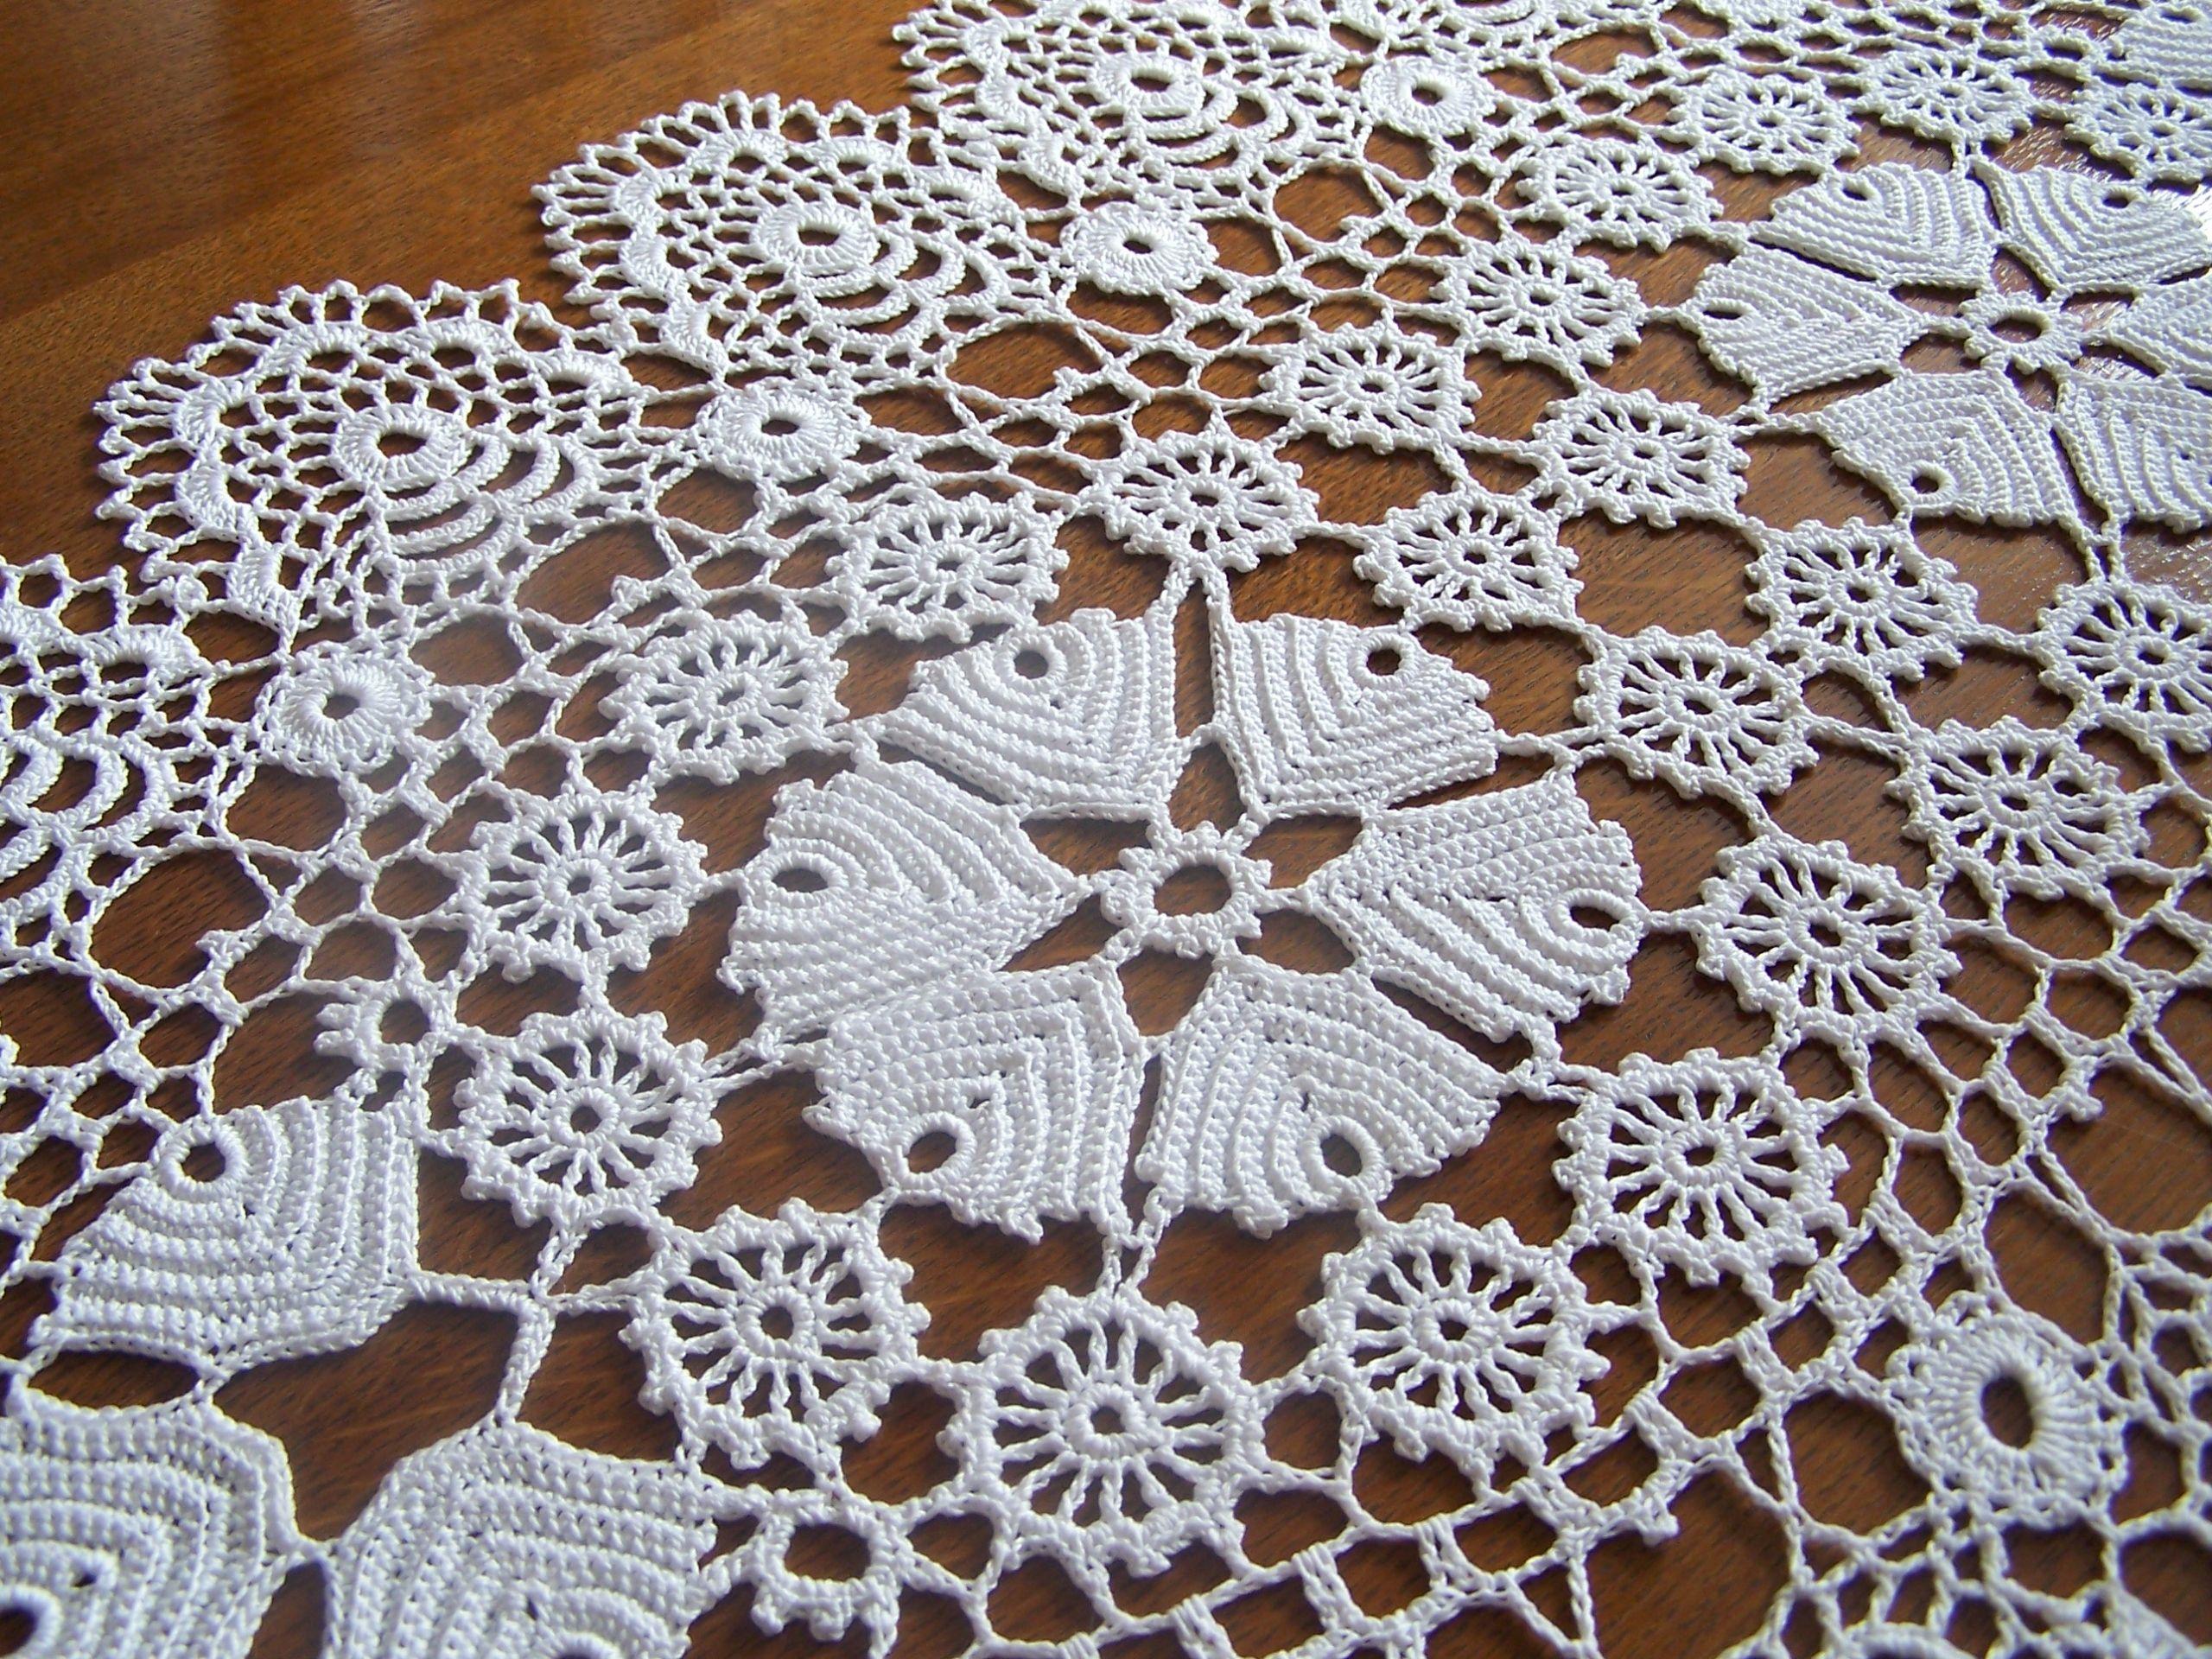 Serweta Bieznik Koronka Irlandzka J Koniakowska 8341481618 Oficjalne Archiwum Allegro Crochet Motif Crochet Doilies Crochet Lace Edging